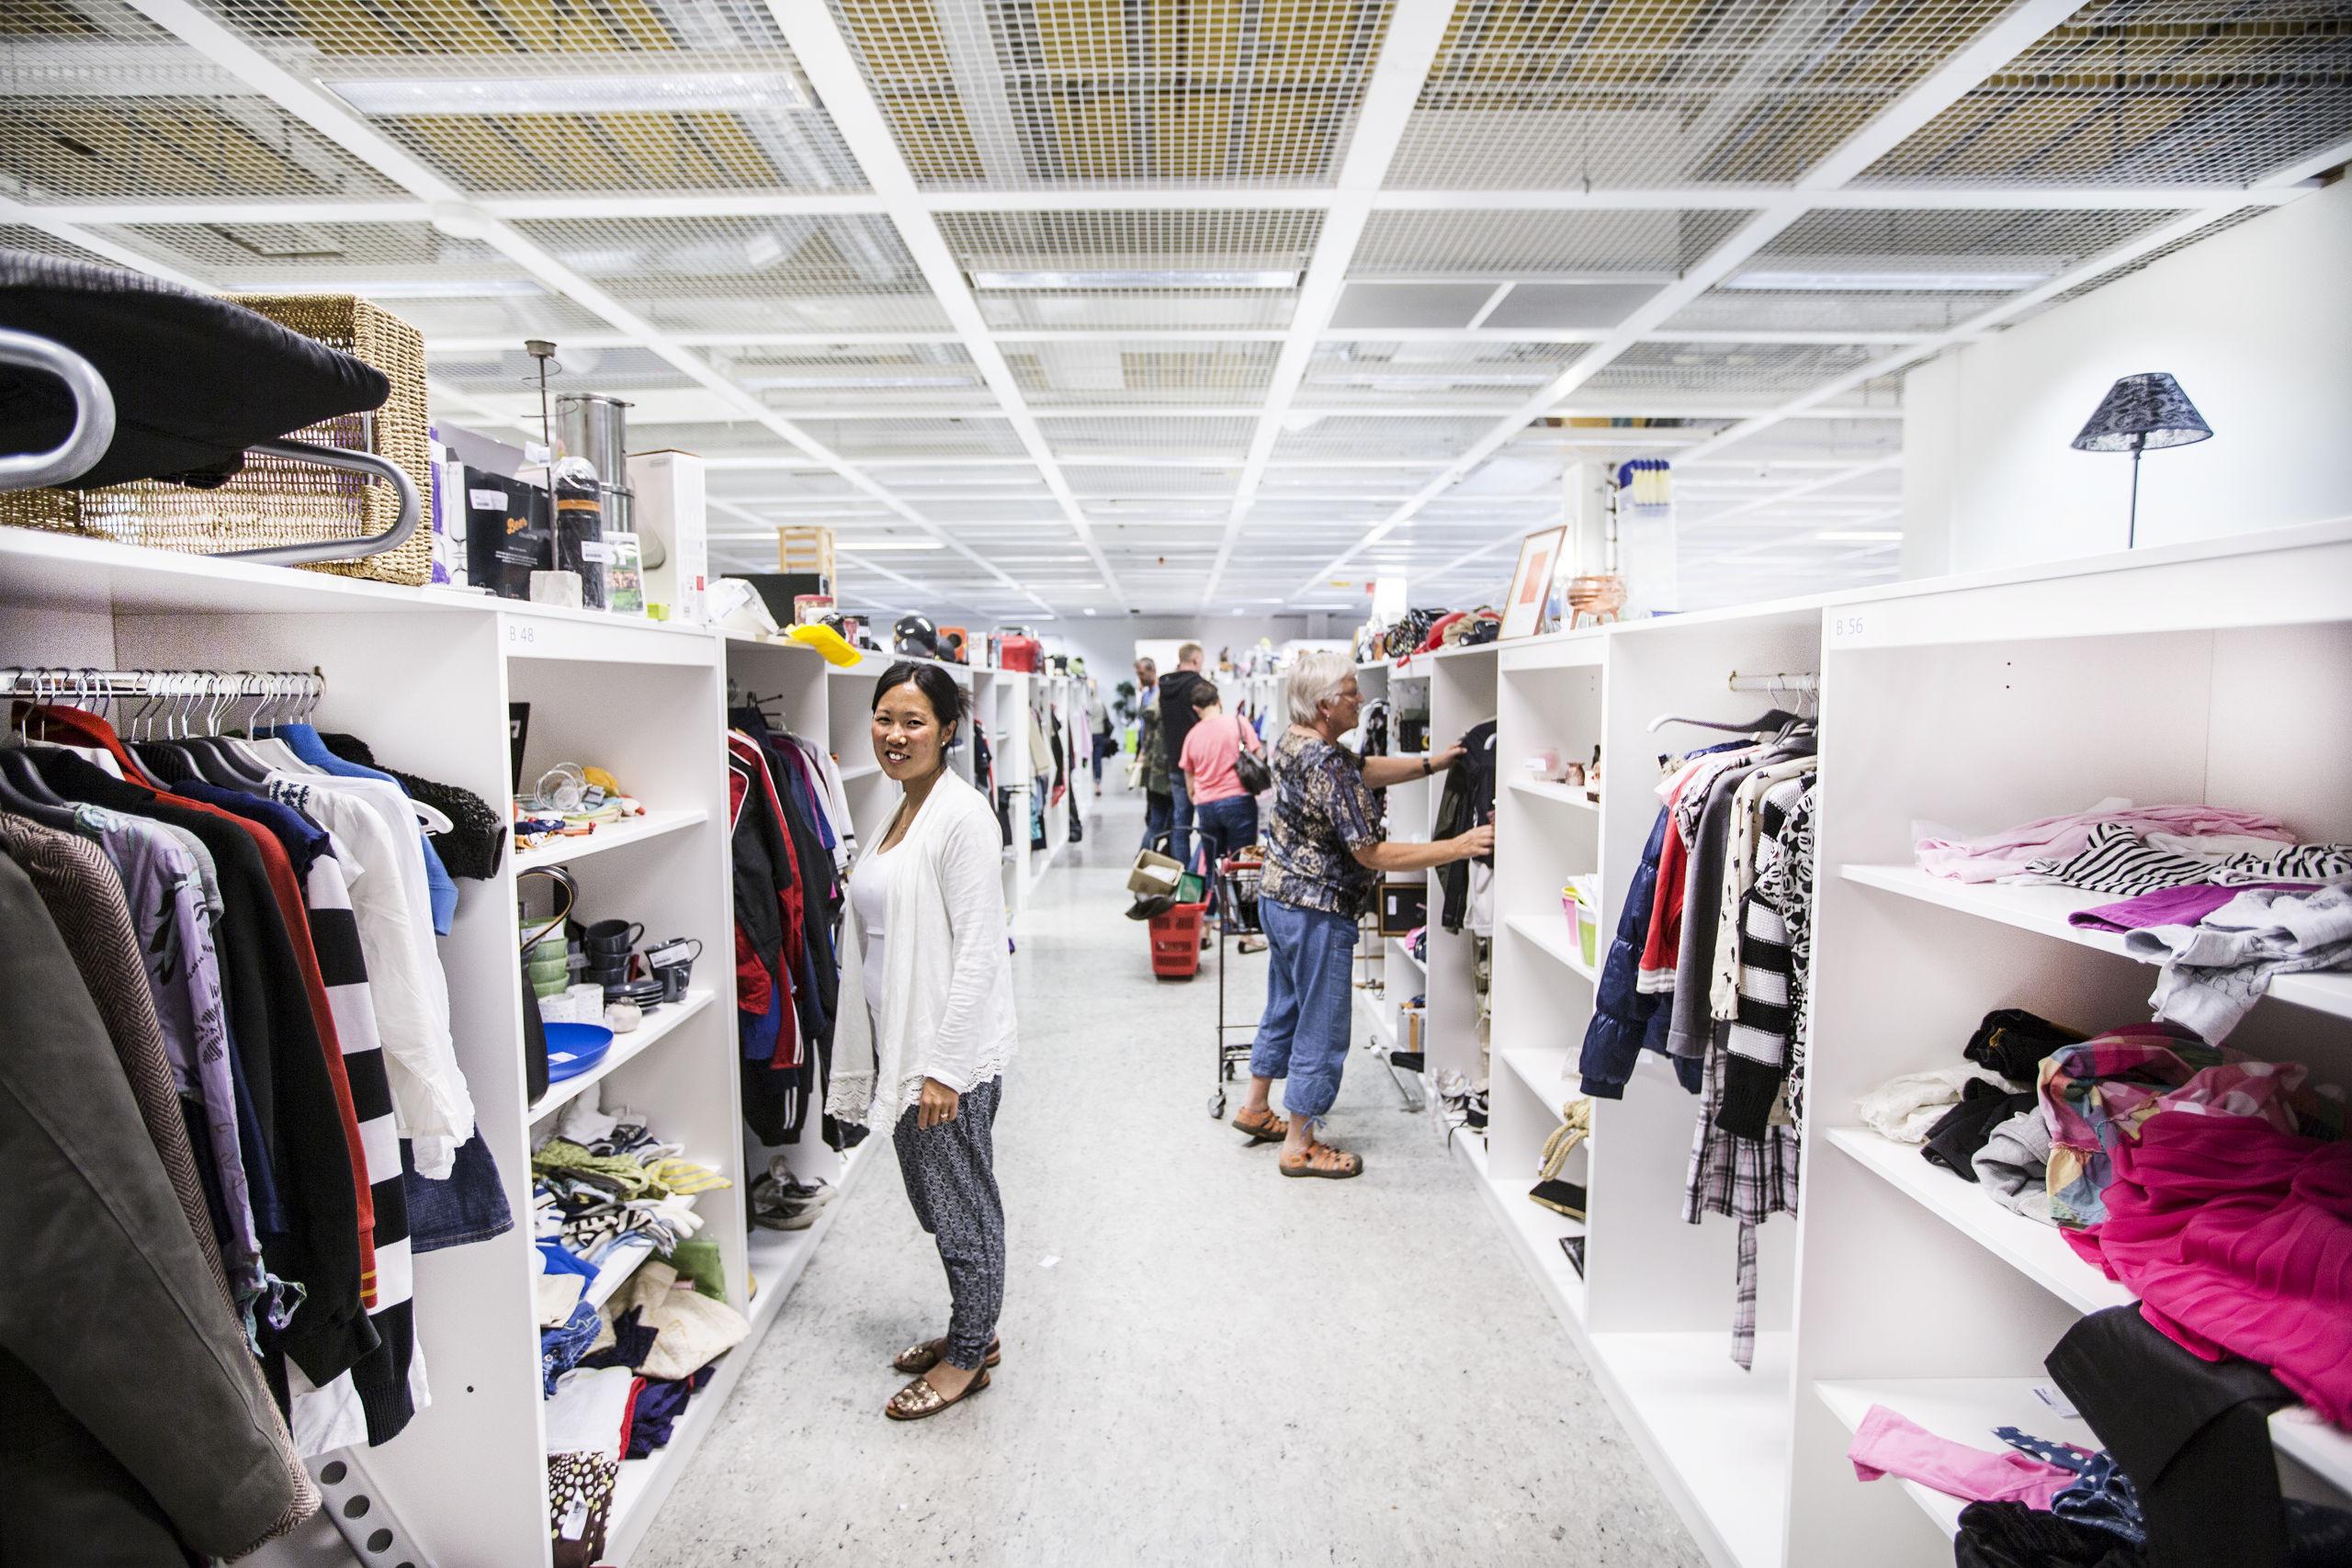 shoppis östersund pris